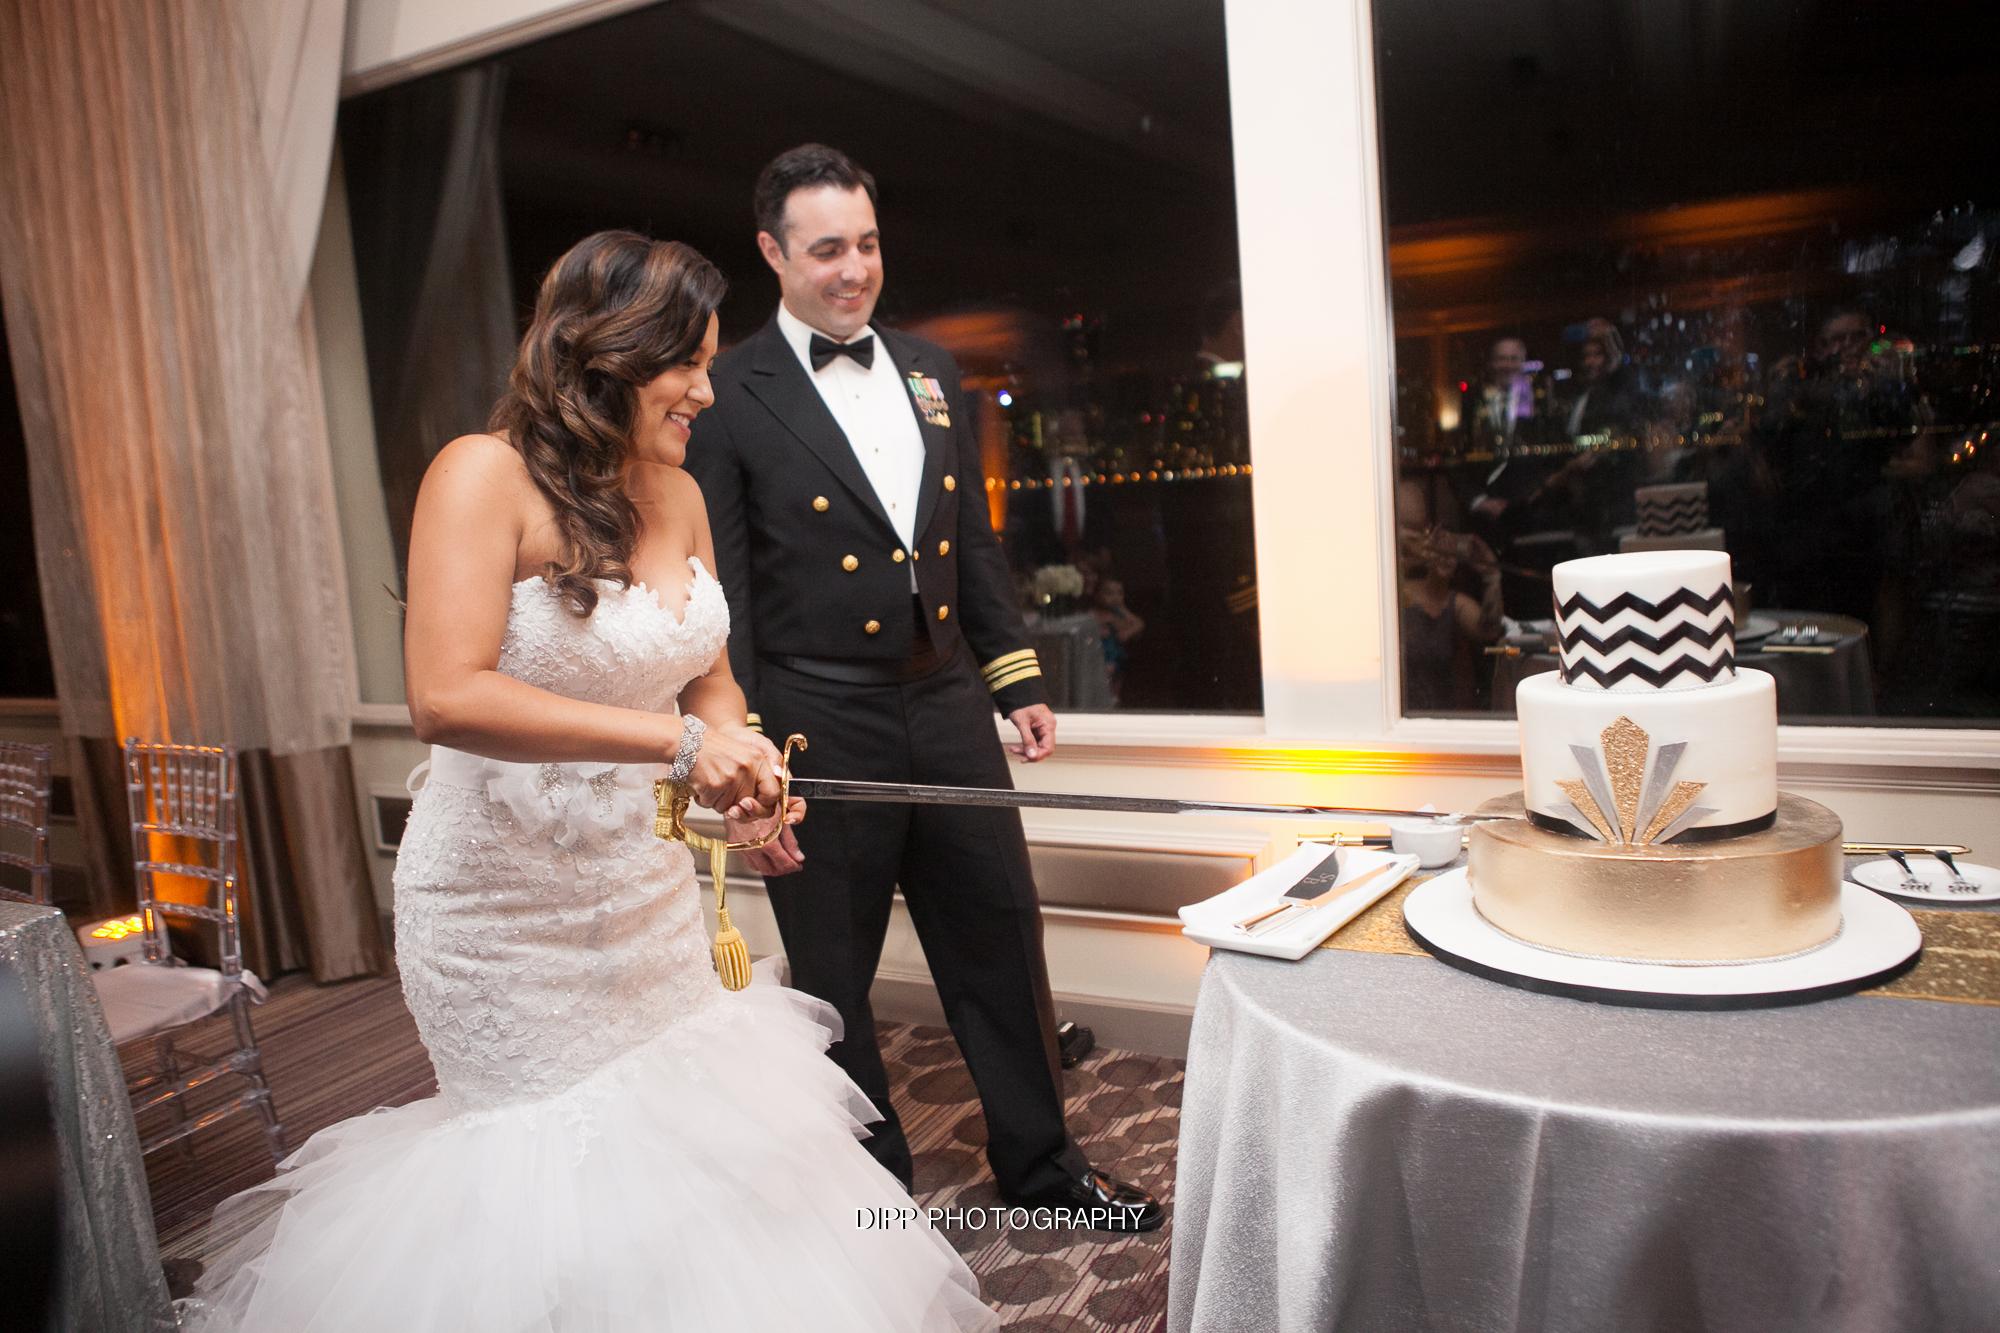 Dipp_2016 EDITED Sara & Brandon Wedding-553